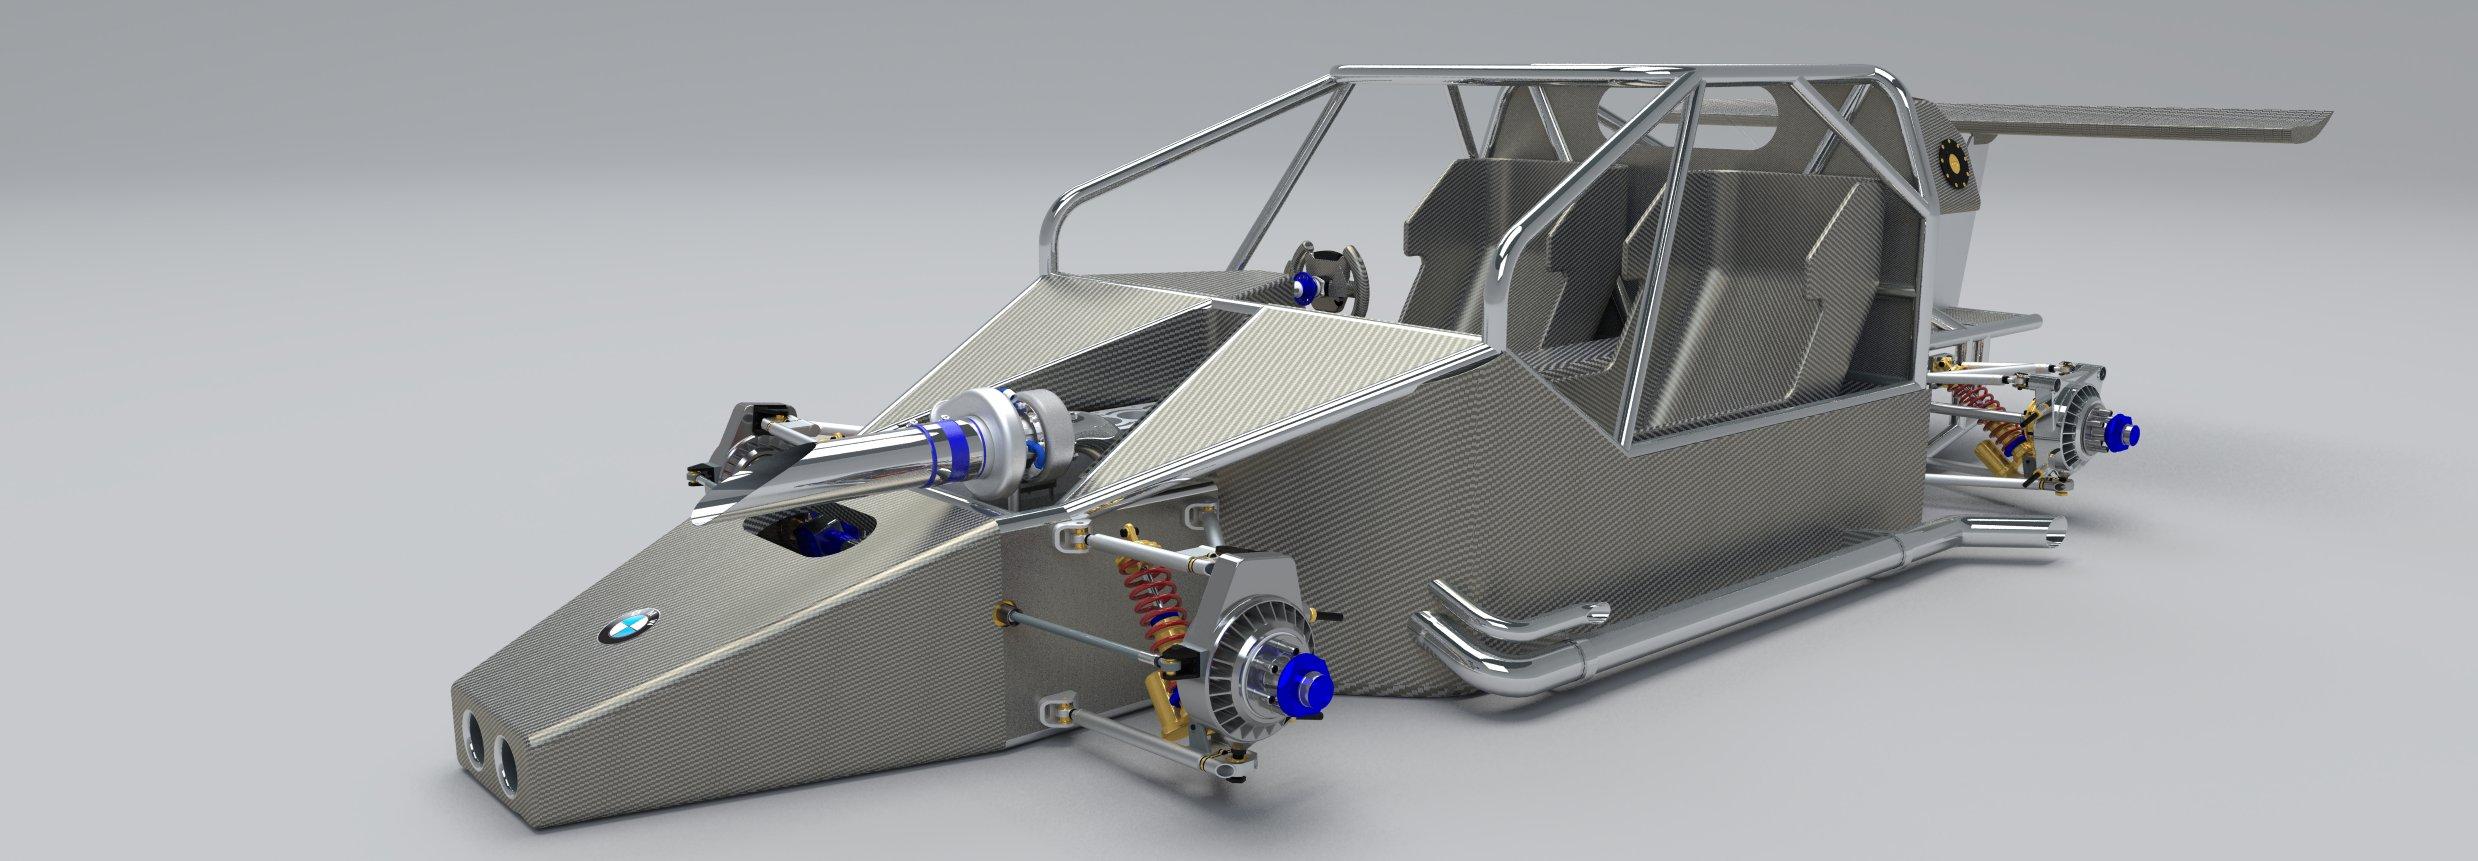 PEASNELL RACING DESIGN _ CONCEPT SKETCH _BMW_RACECAR (7)